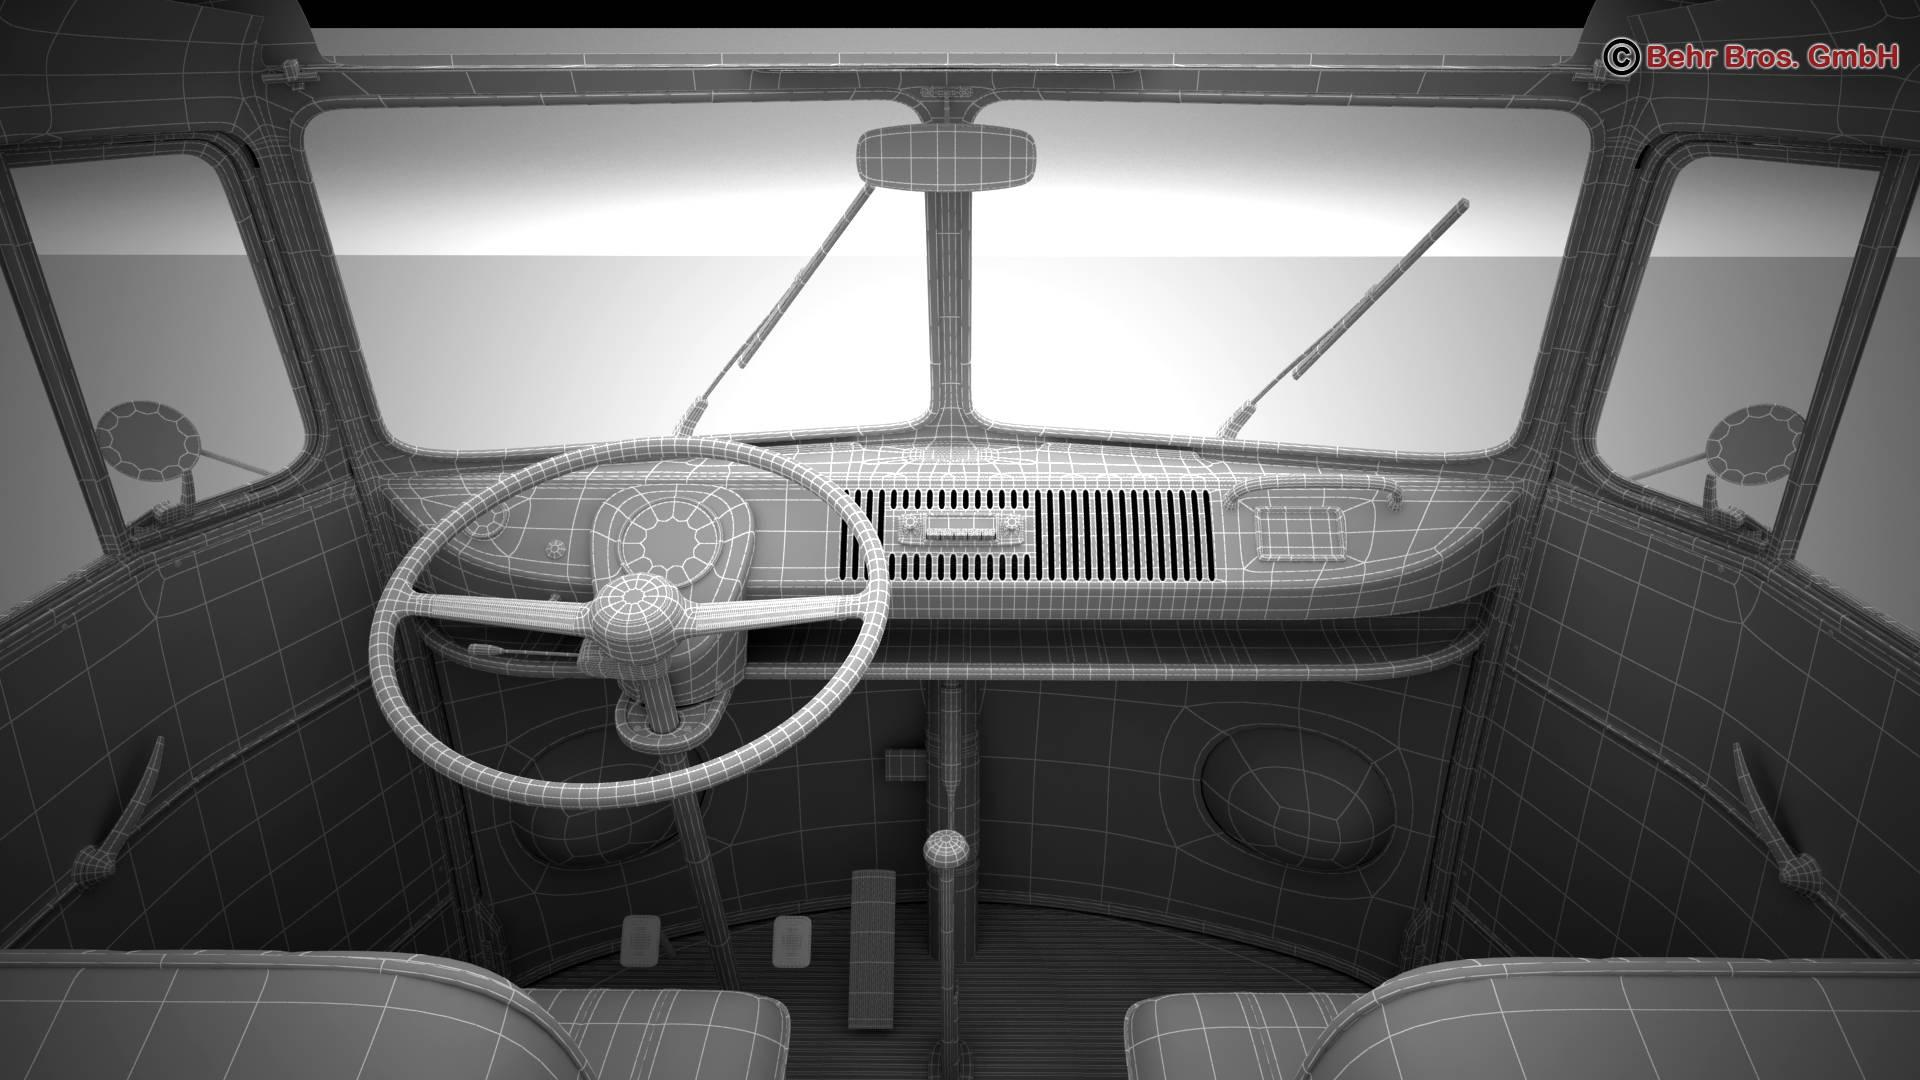 volkswagen type 2 samba 1963 hippie 3d model 3ds max fbx c4d lwo ma mb obj 217270